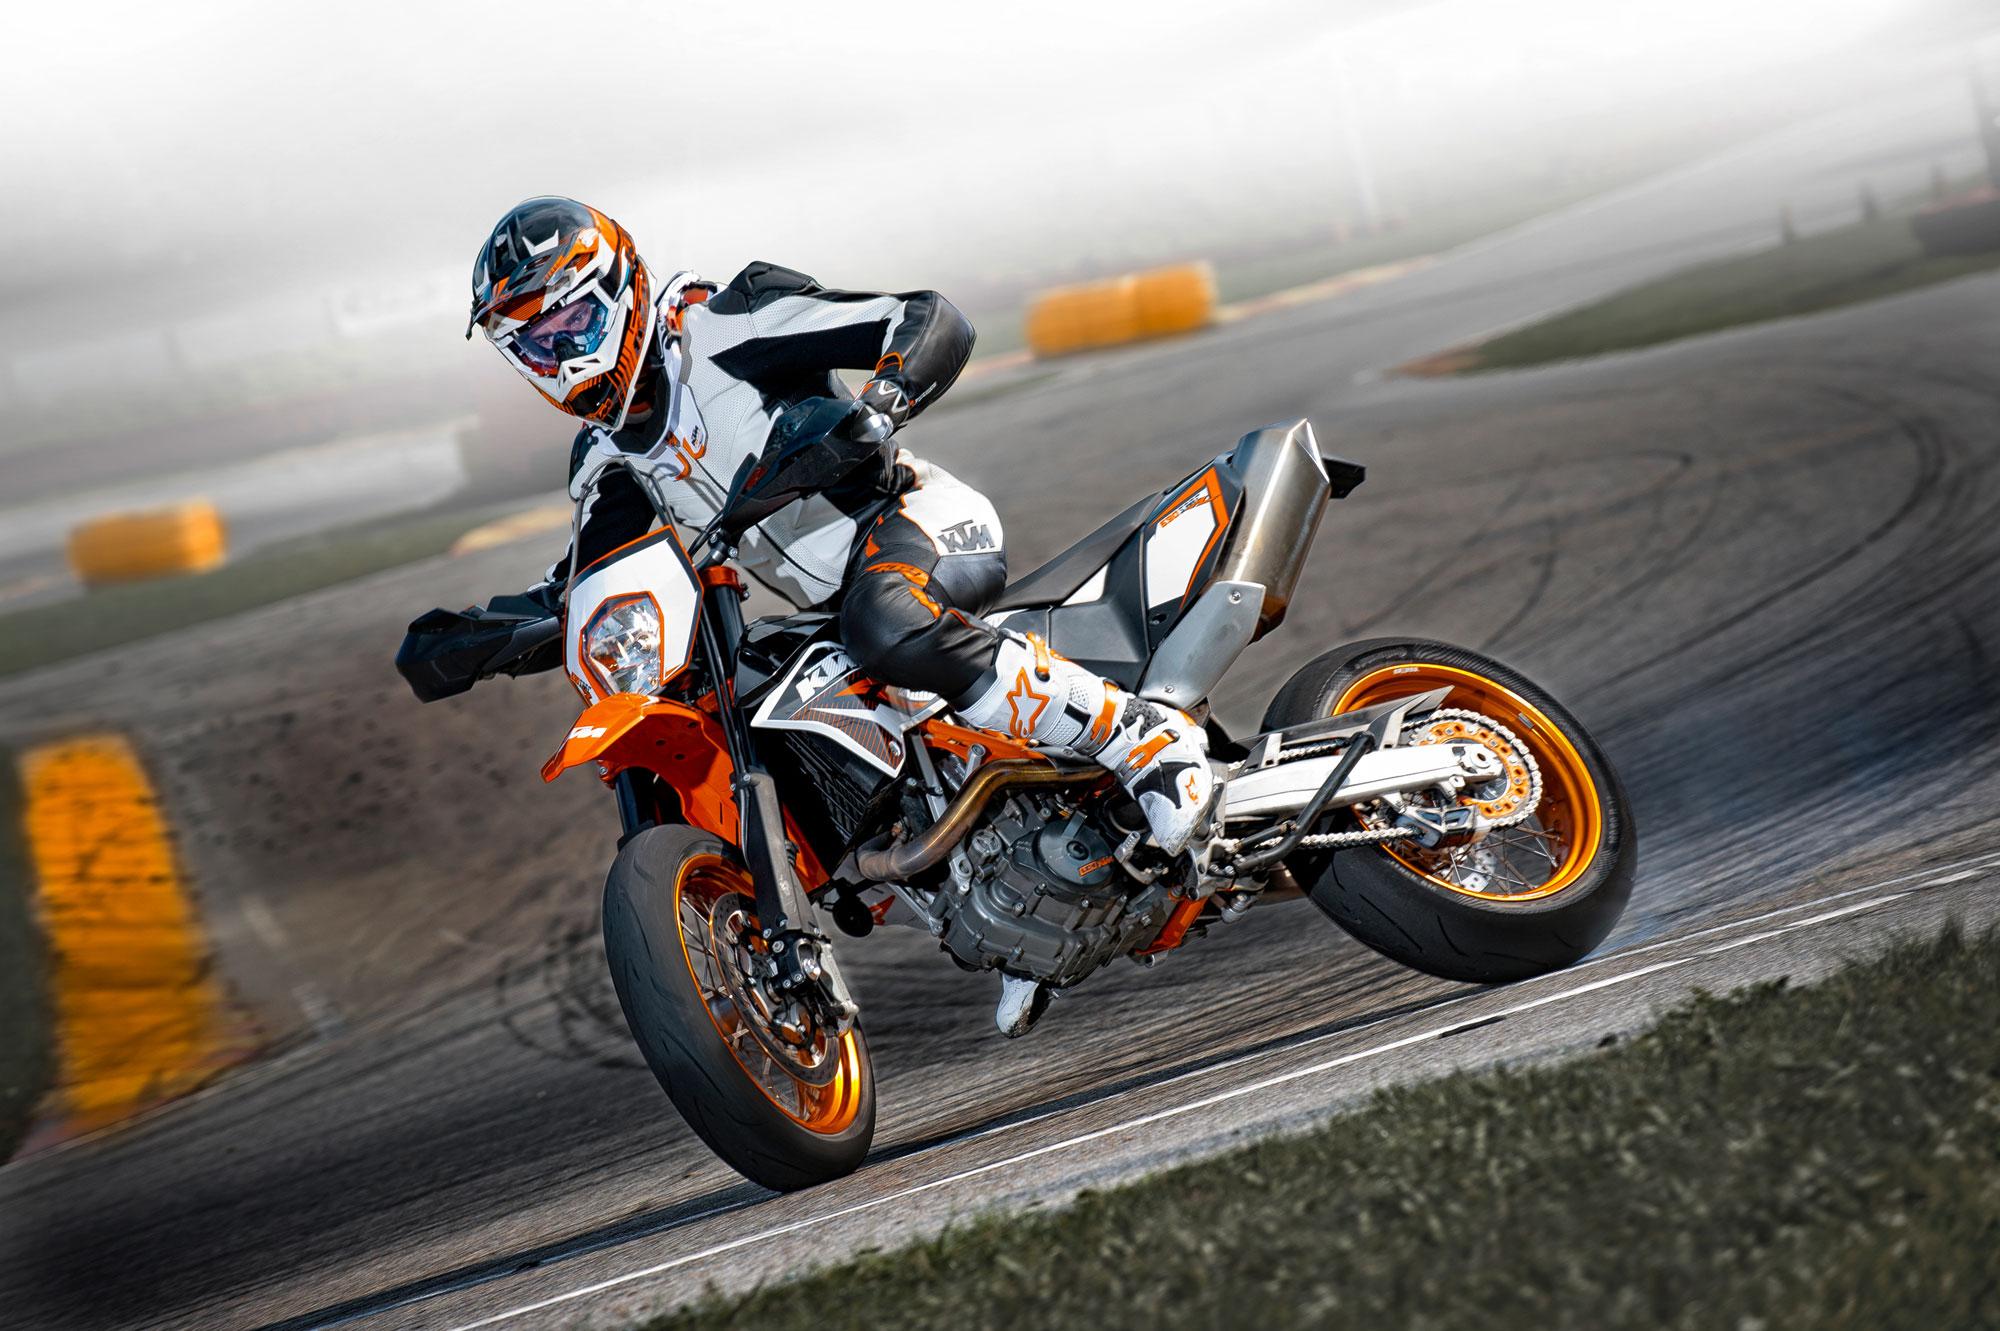 2012 KTM 690 SMCR wallpaper 2000x1331 91043 WallpaperUP 2000x1331